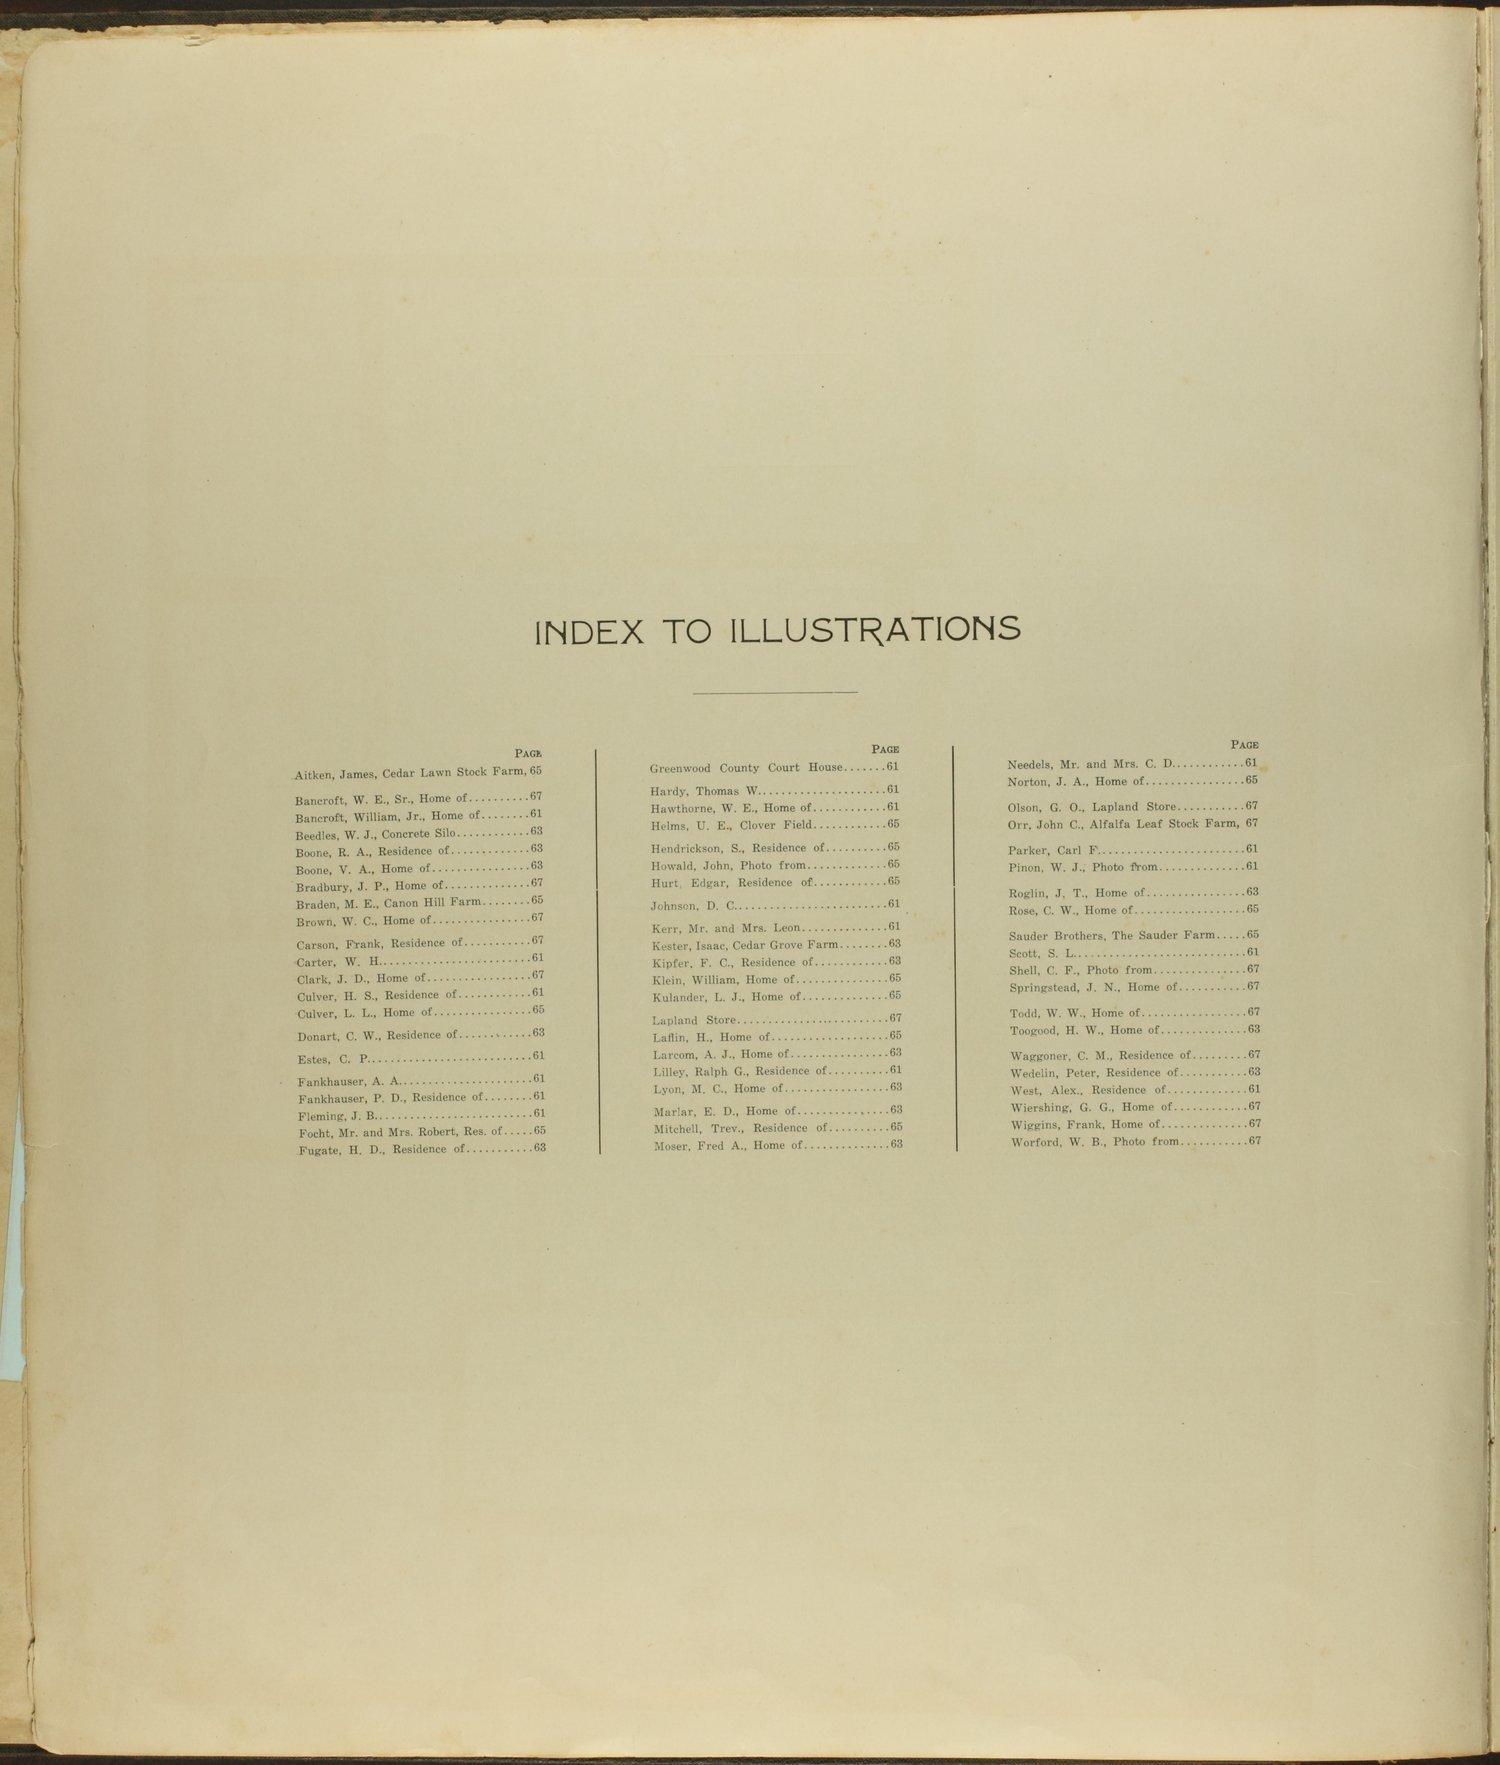 Standard atlas of Greenwood County, Kansas - Index to Illustrations